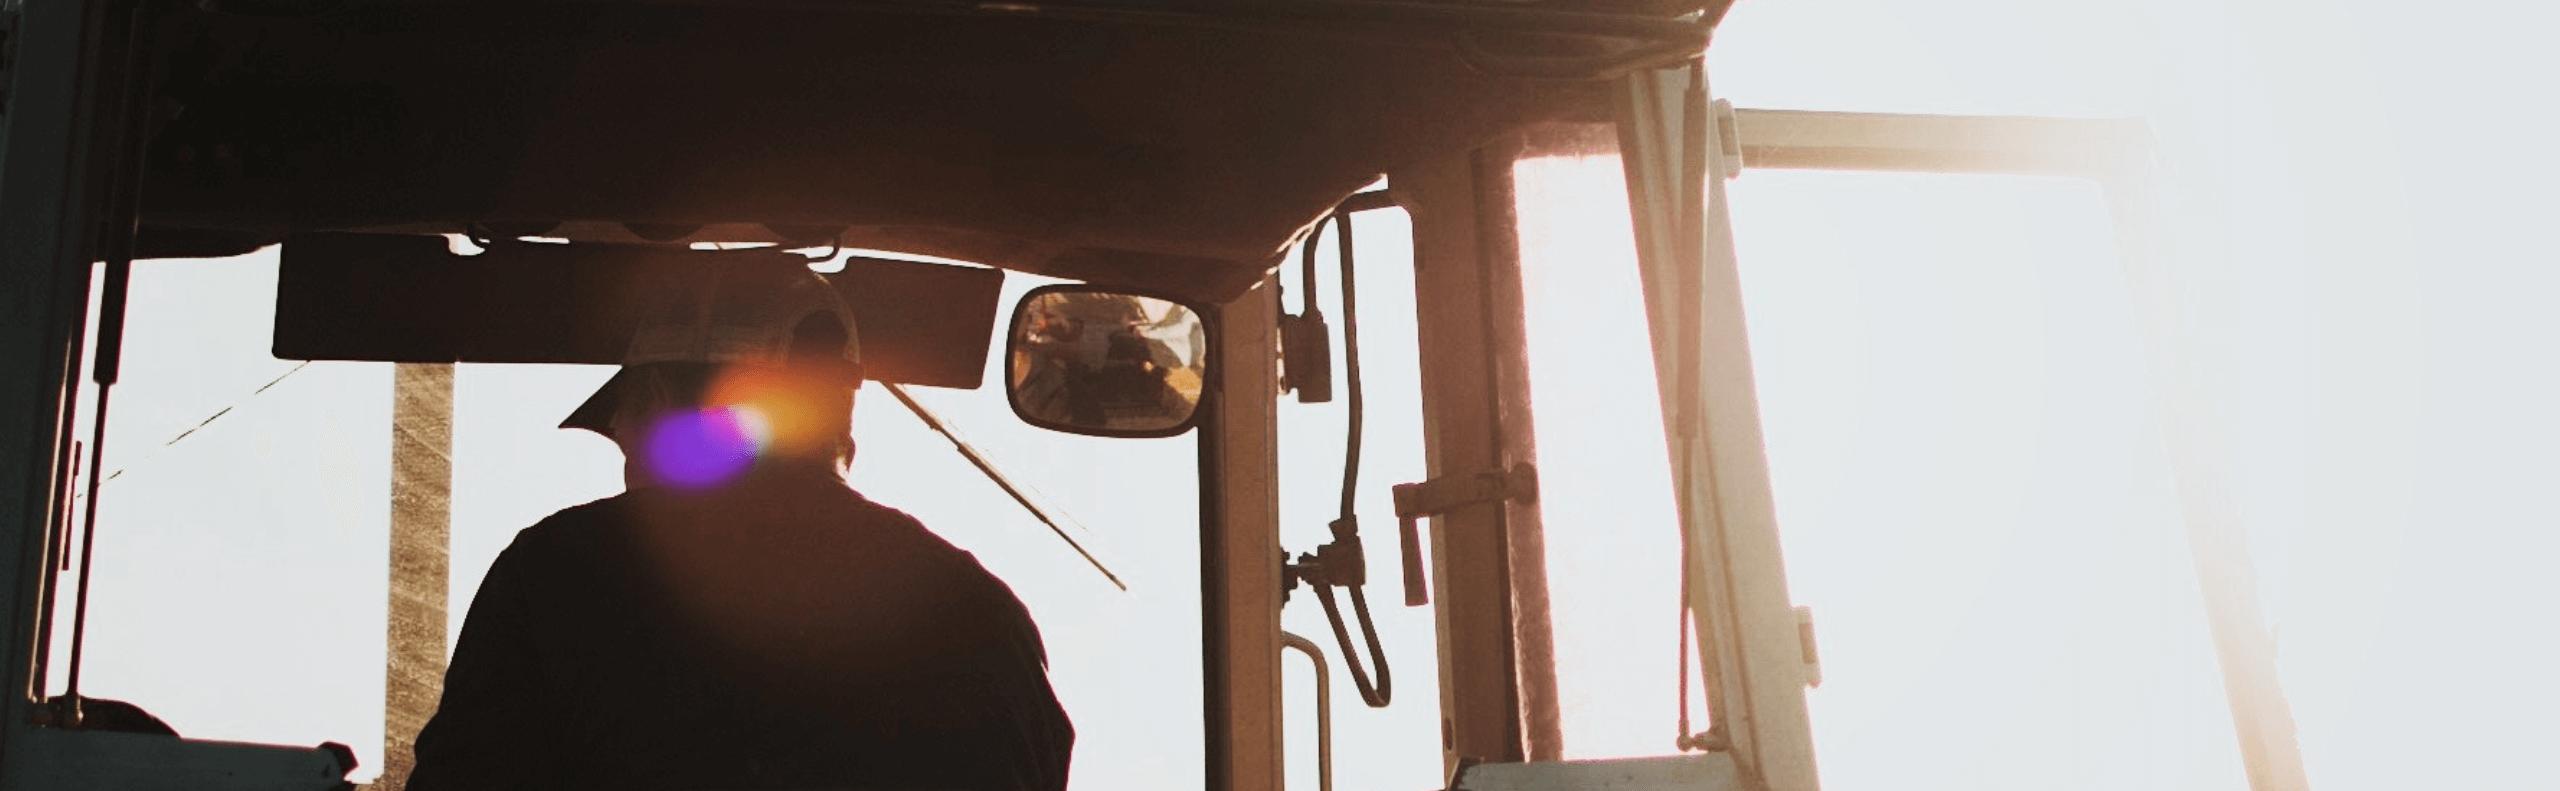 Tractor image edit